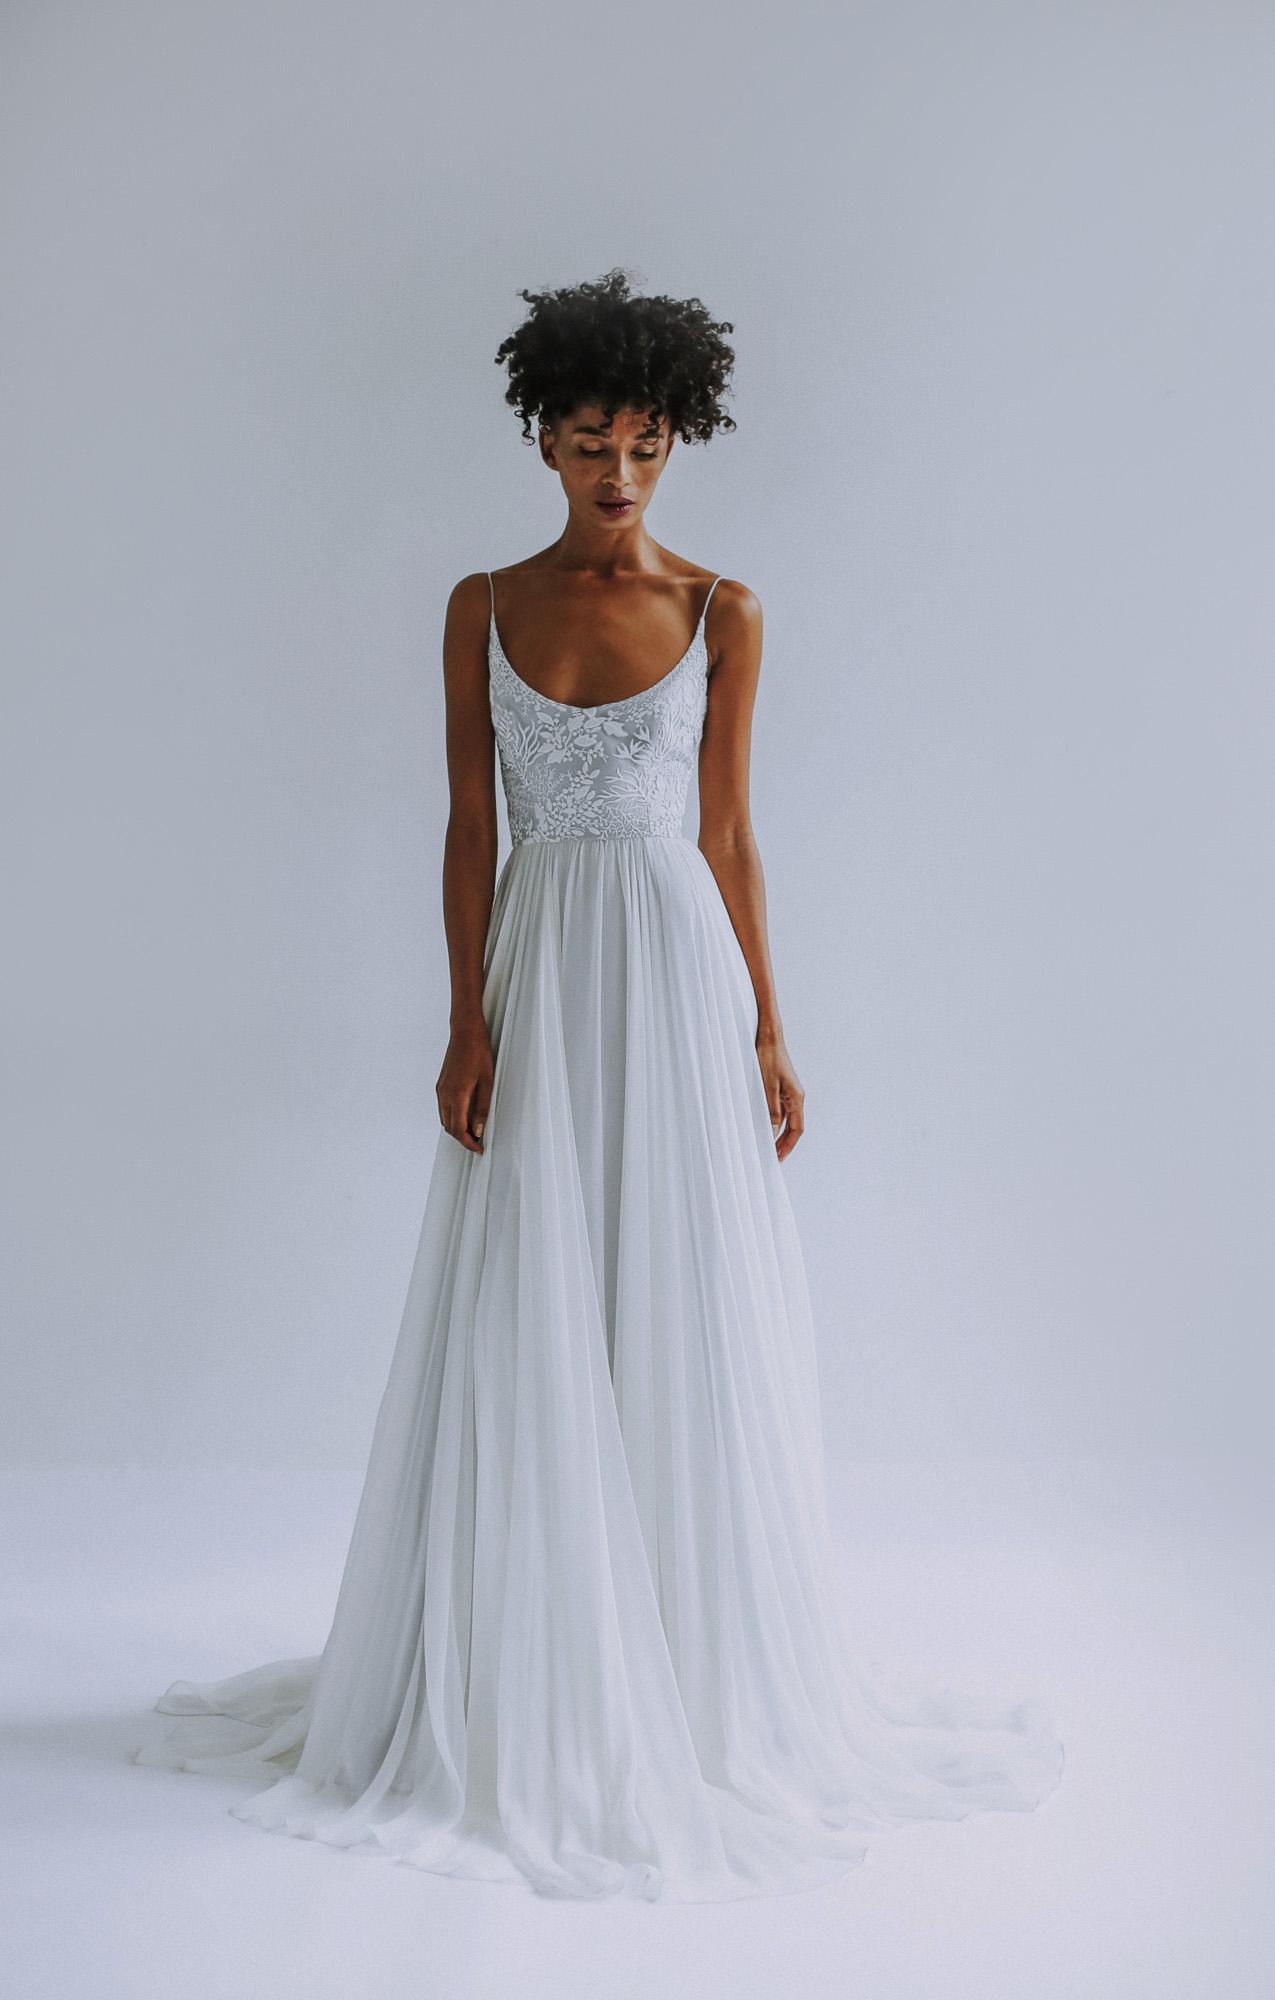 leanne-marshall-wedding-gown-15.jpg